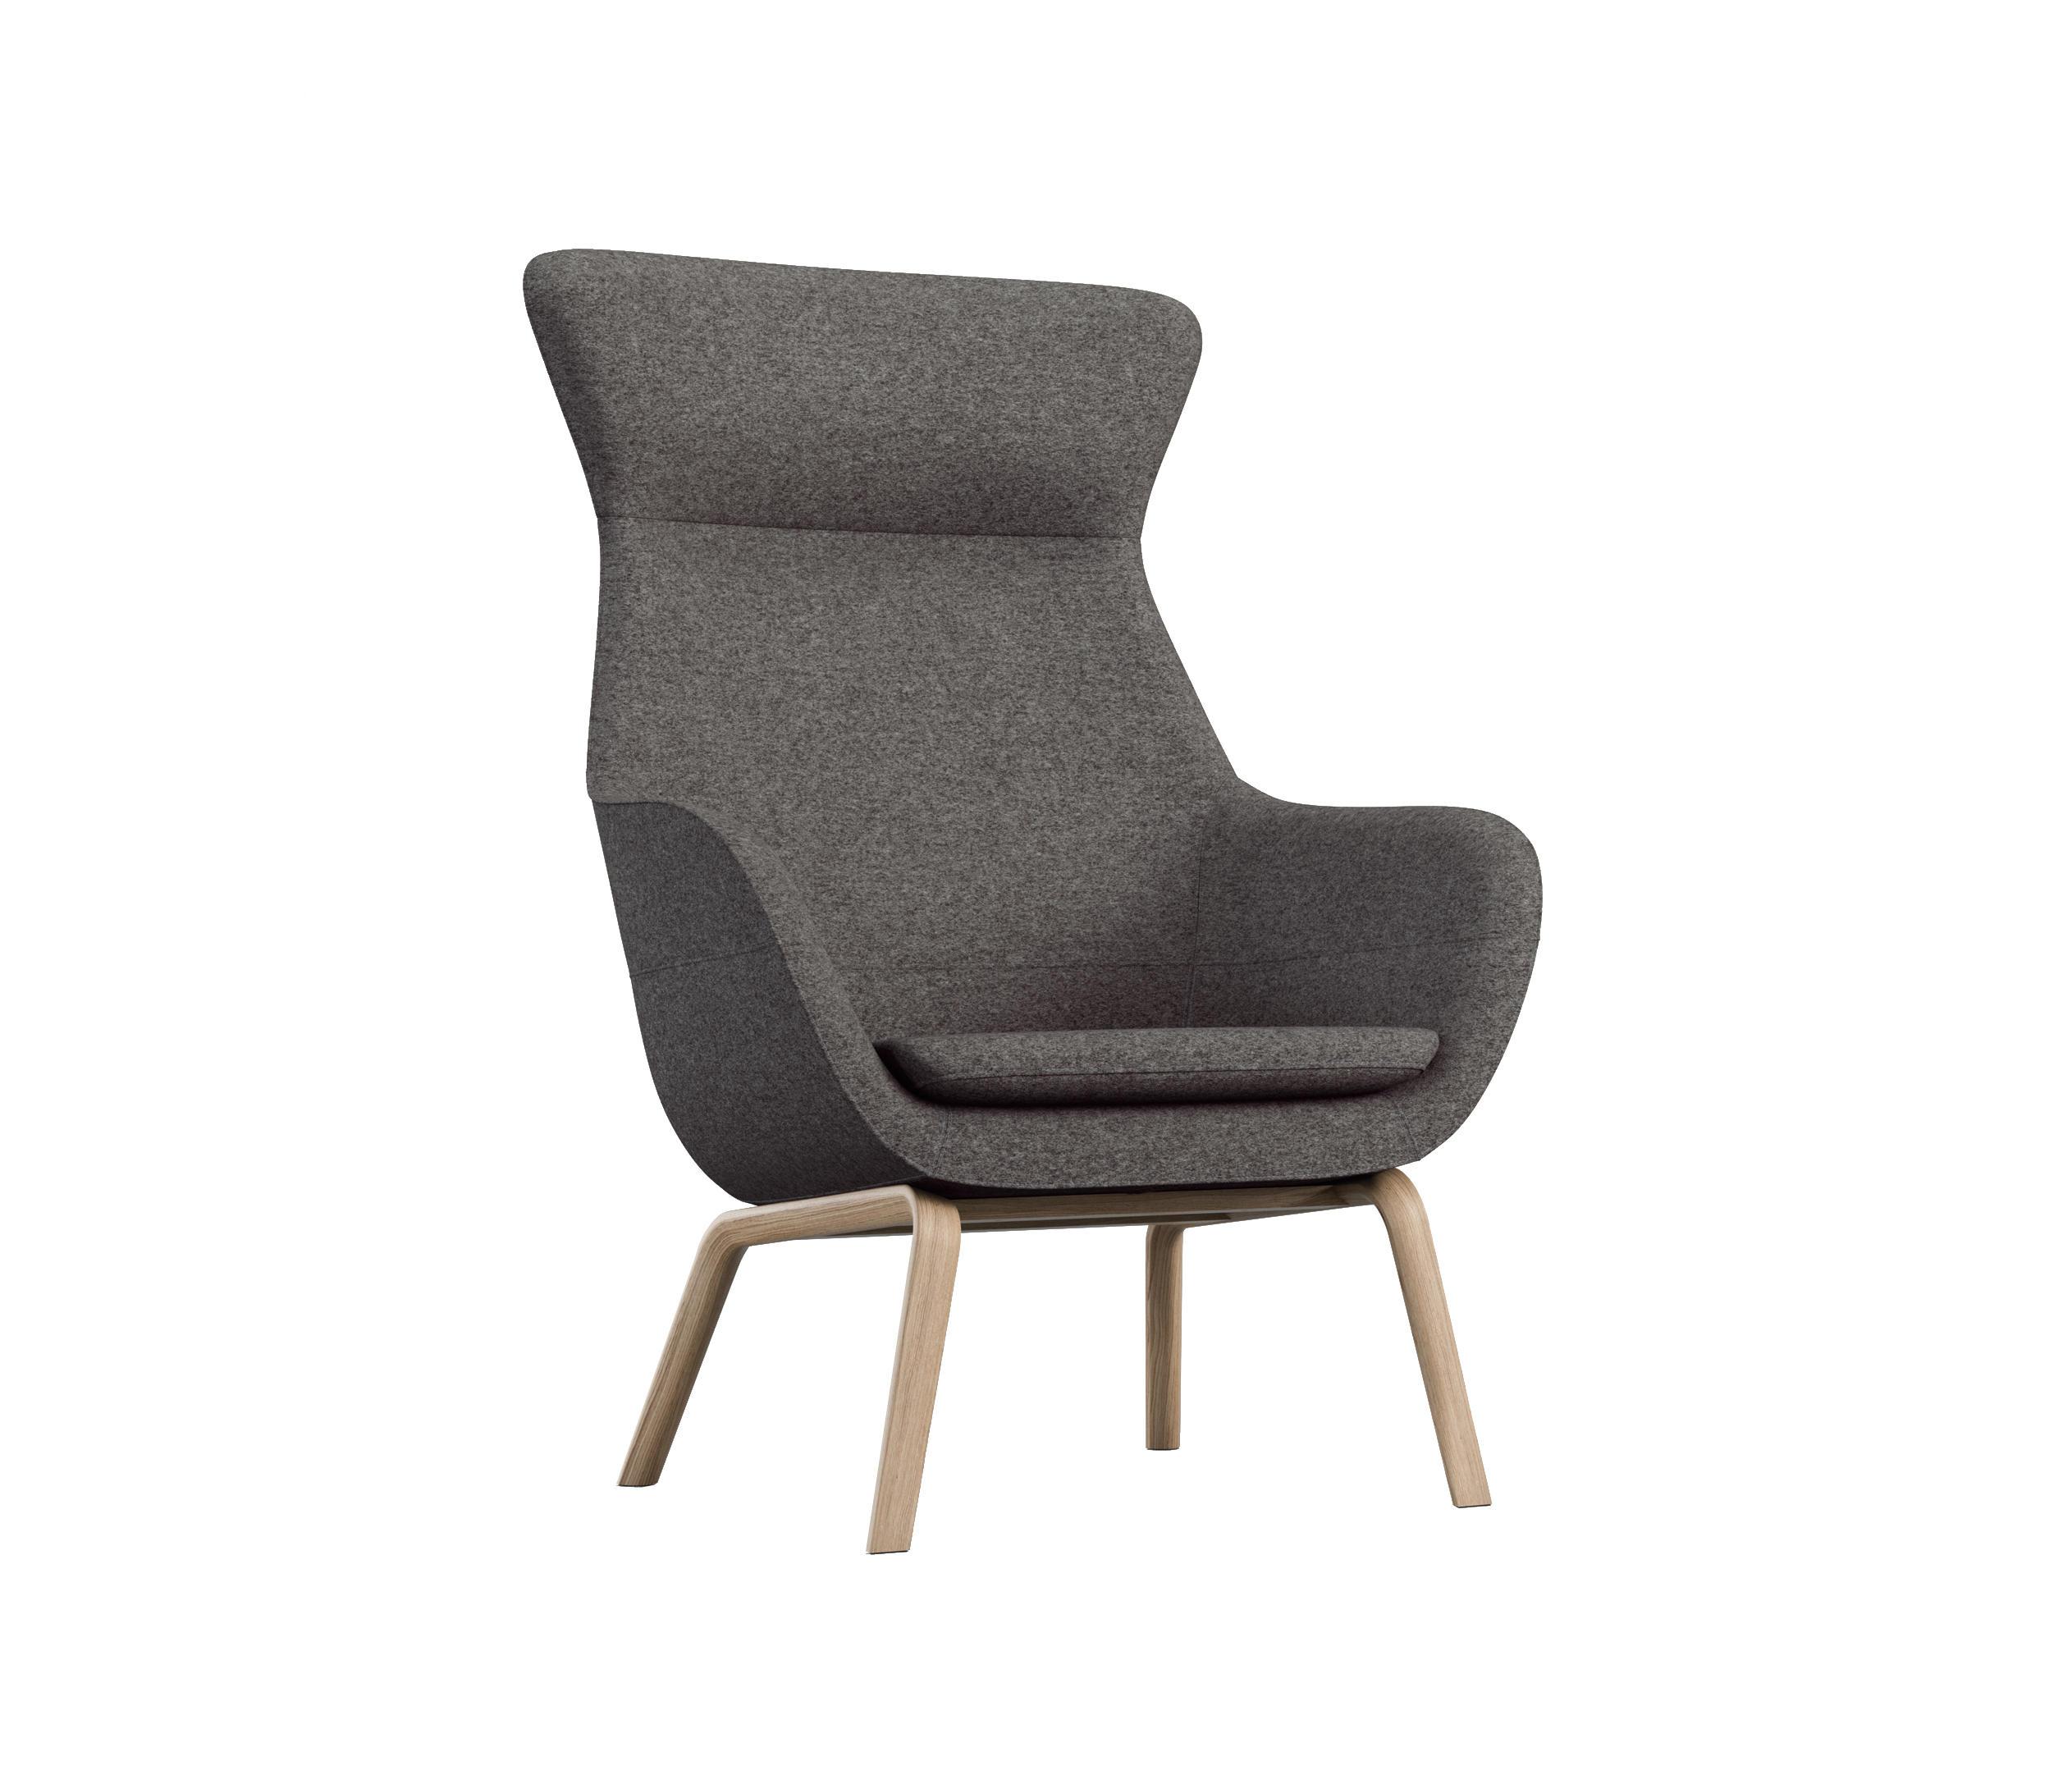 Ohrenbacken Sofa crona lounge easy chair 6387 ah lounge chairs from brunner